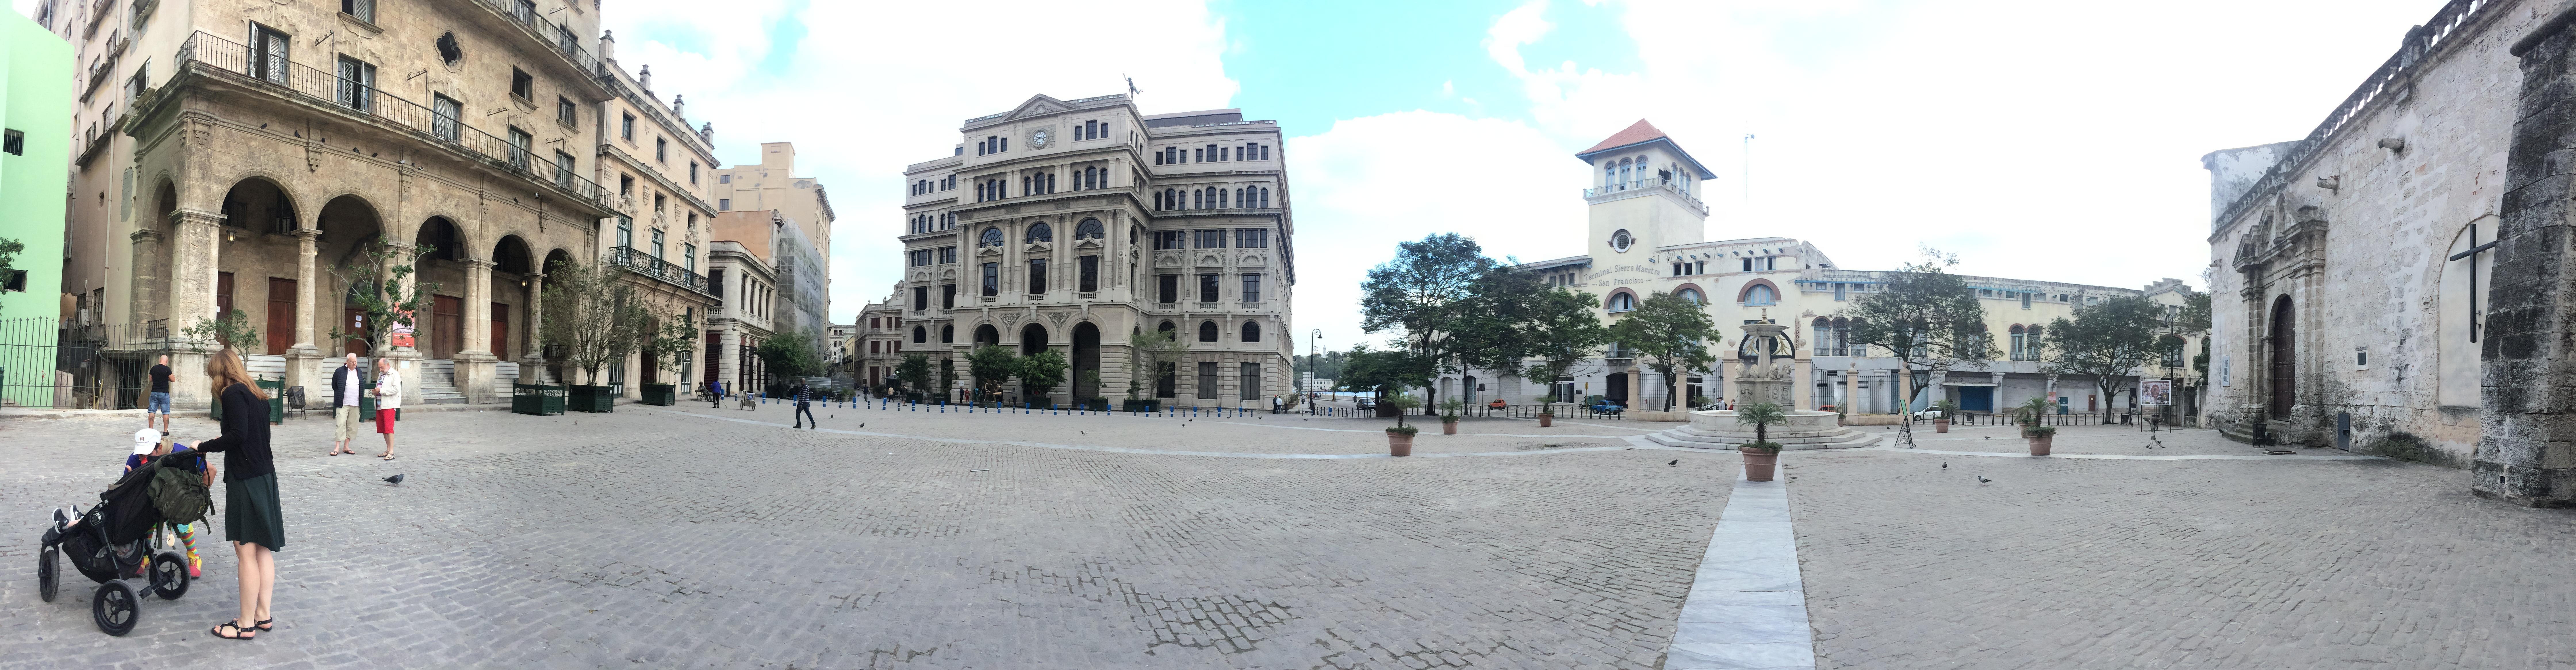 063 Havanna Plaza de San Fransisco